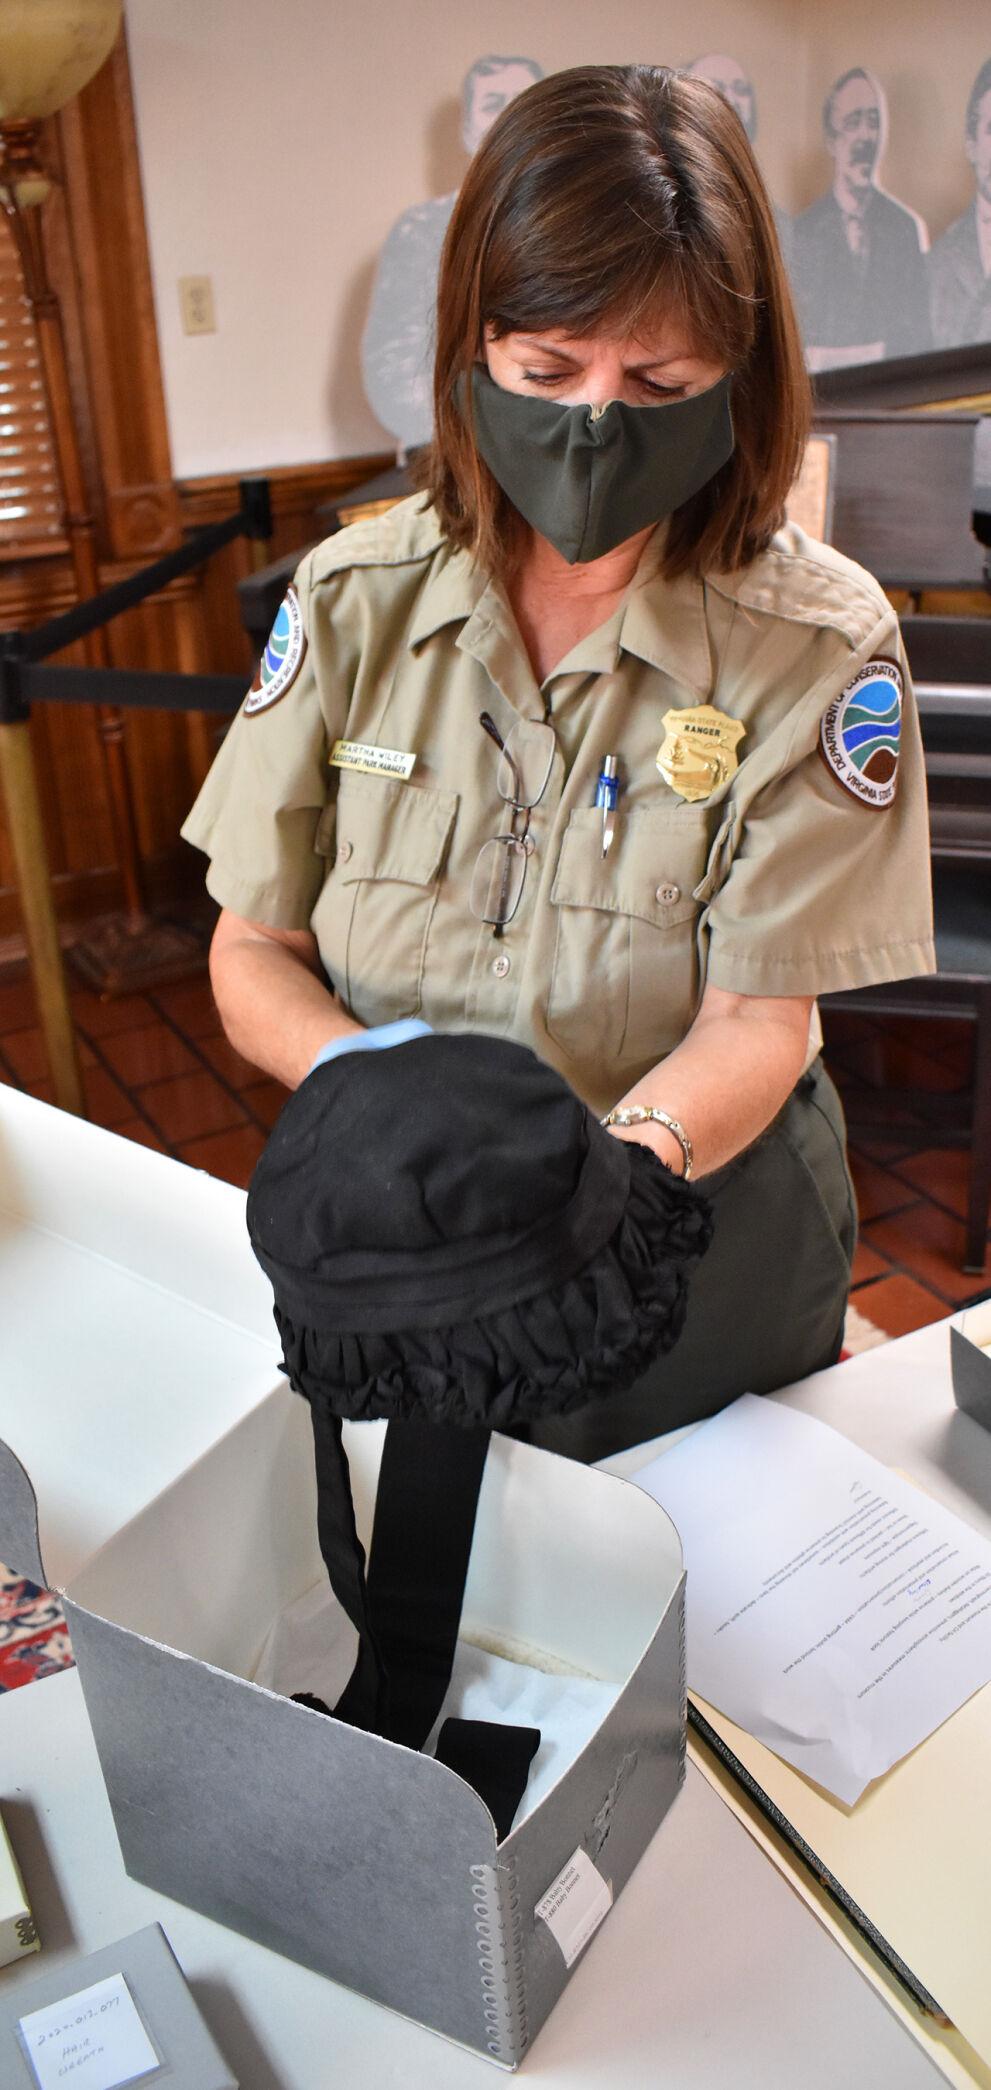 Southwest Virginia Museum - funereal bonnet